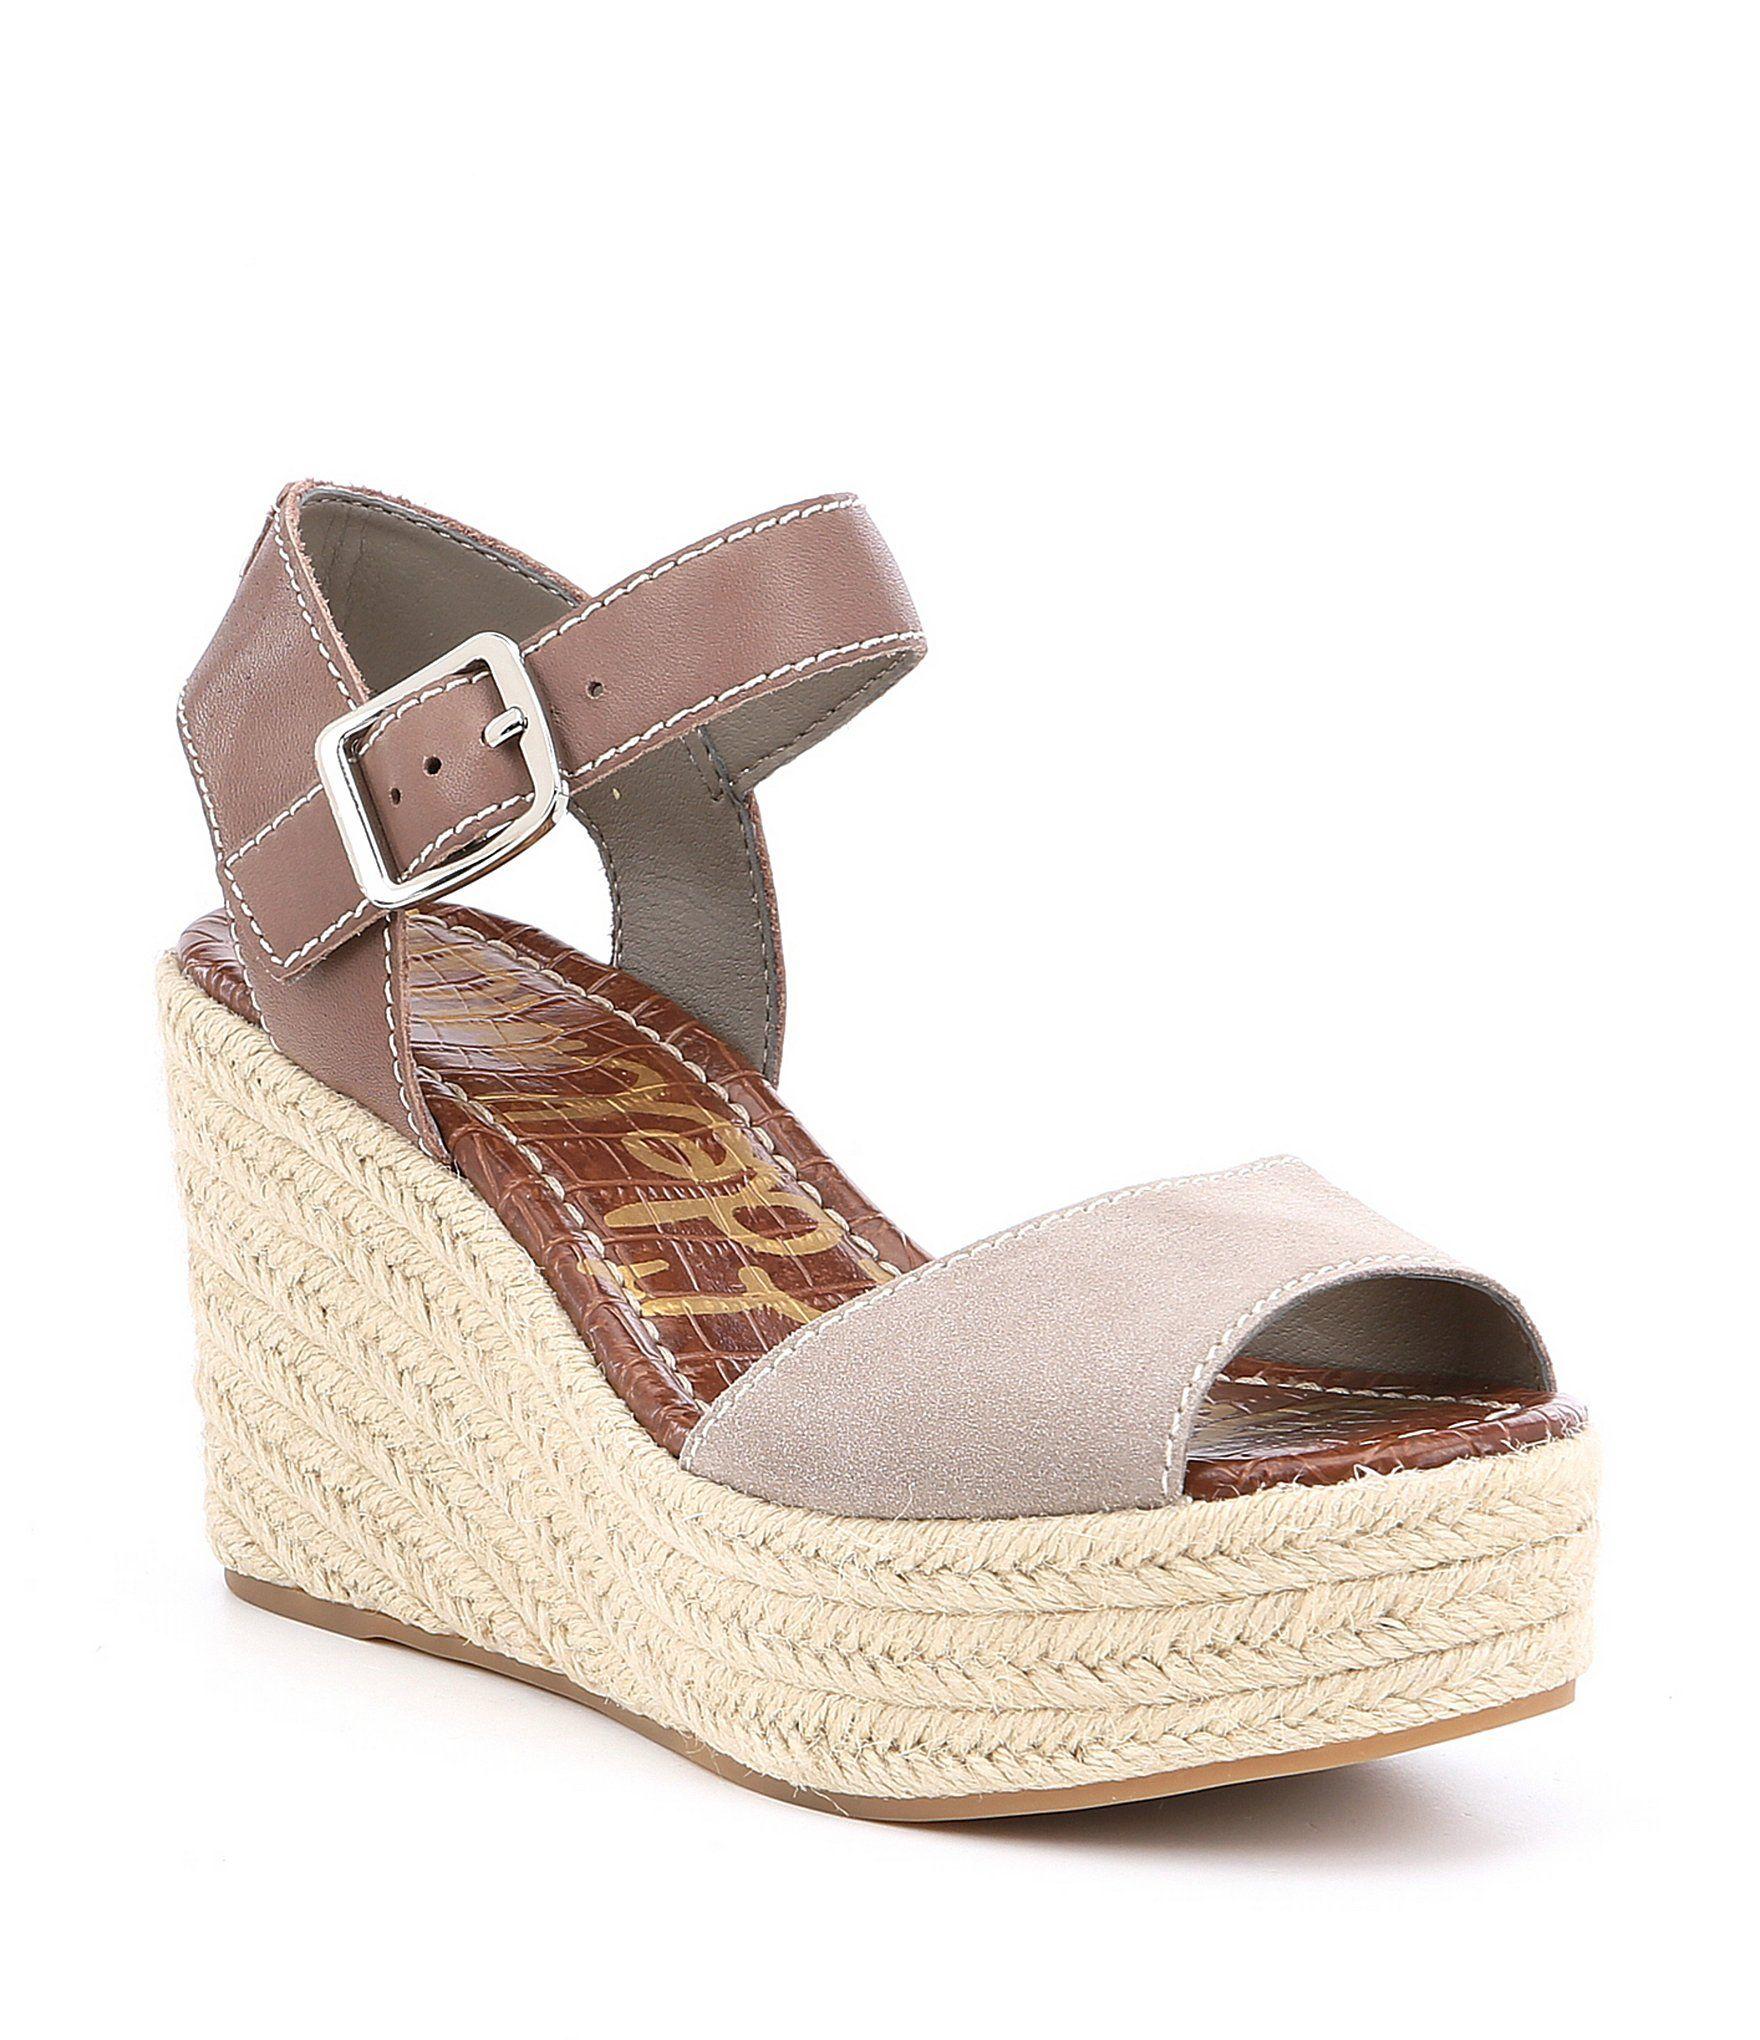 d99bc317d Shop for Pelle Moda Kauai Espadrille Suede Ankle Strap Wedge Sandals at  Dillards.com. Visit Dillards.com to find clothing, access…